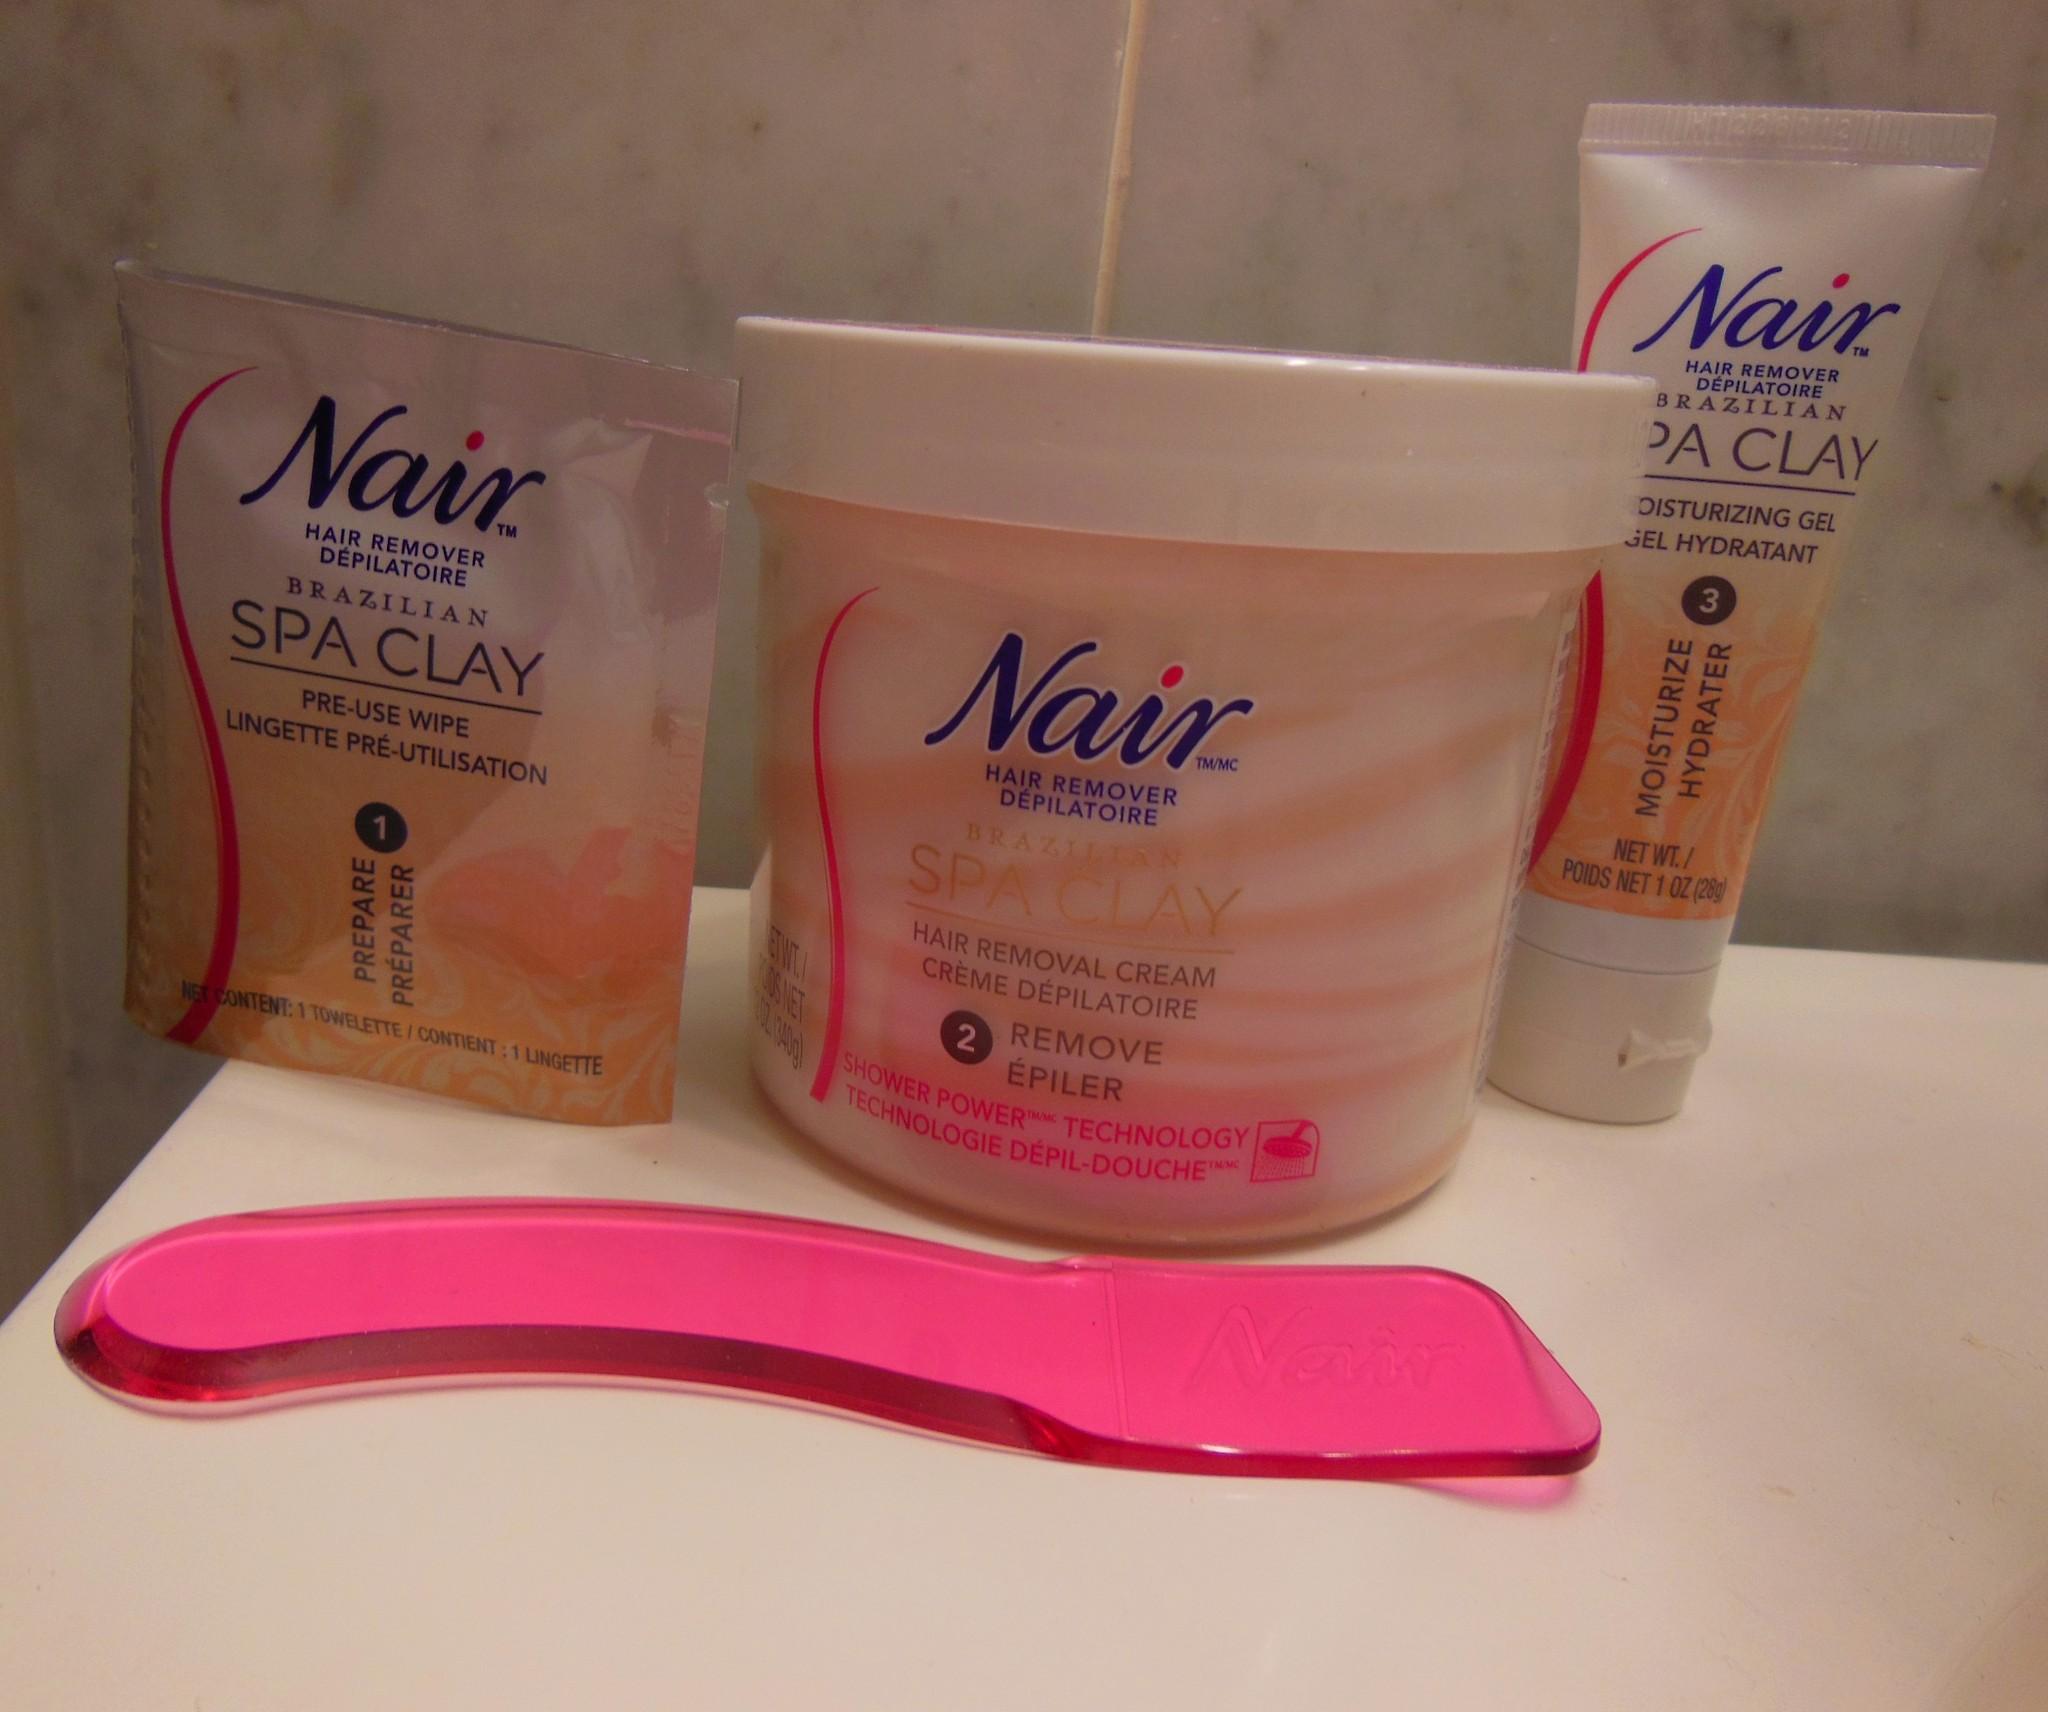 Bikini hair product removal